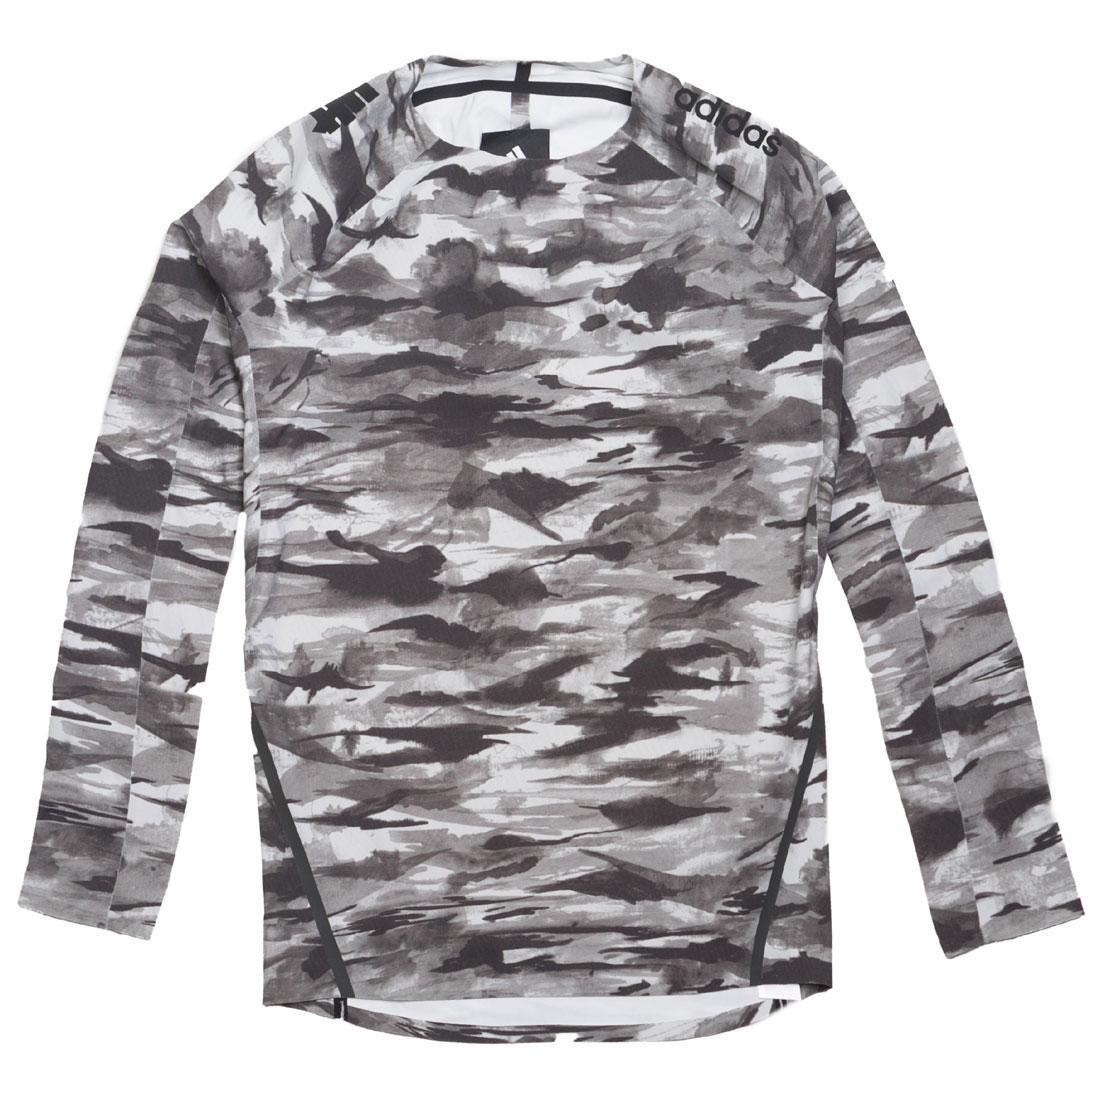 05720cedb4331 Adidas x Undefeated Men Alphaskin 360 1/1 Top Long Sleeve Tee black white  shift grey